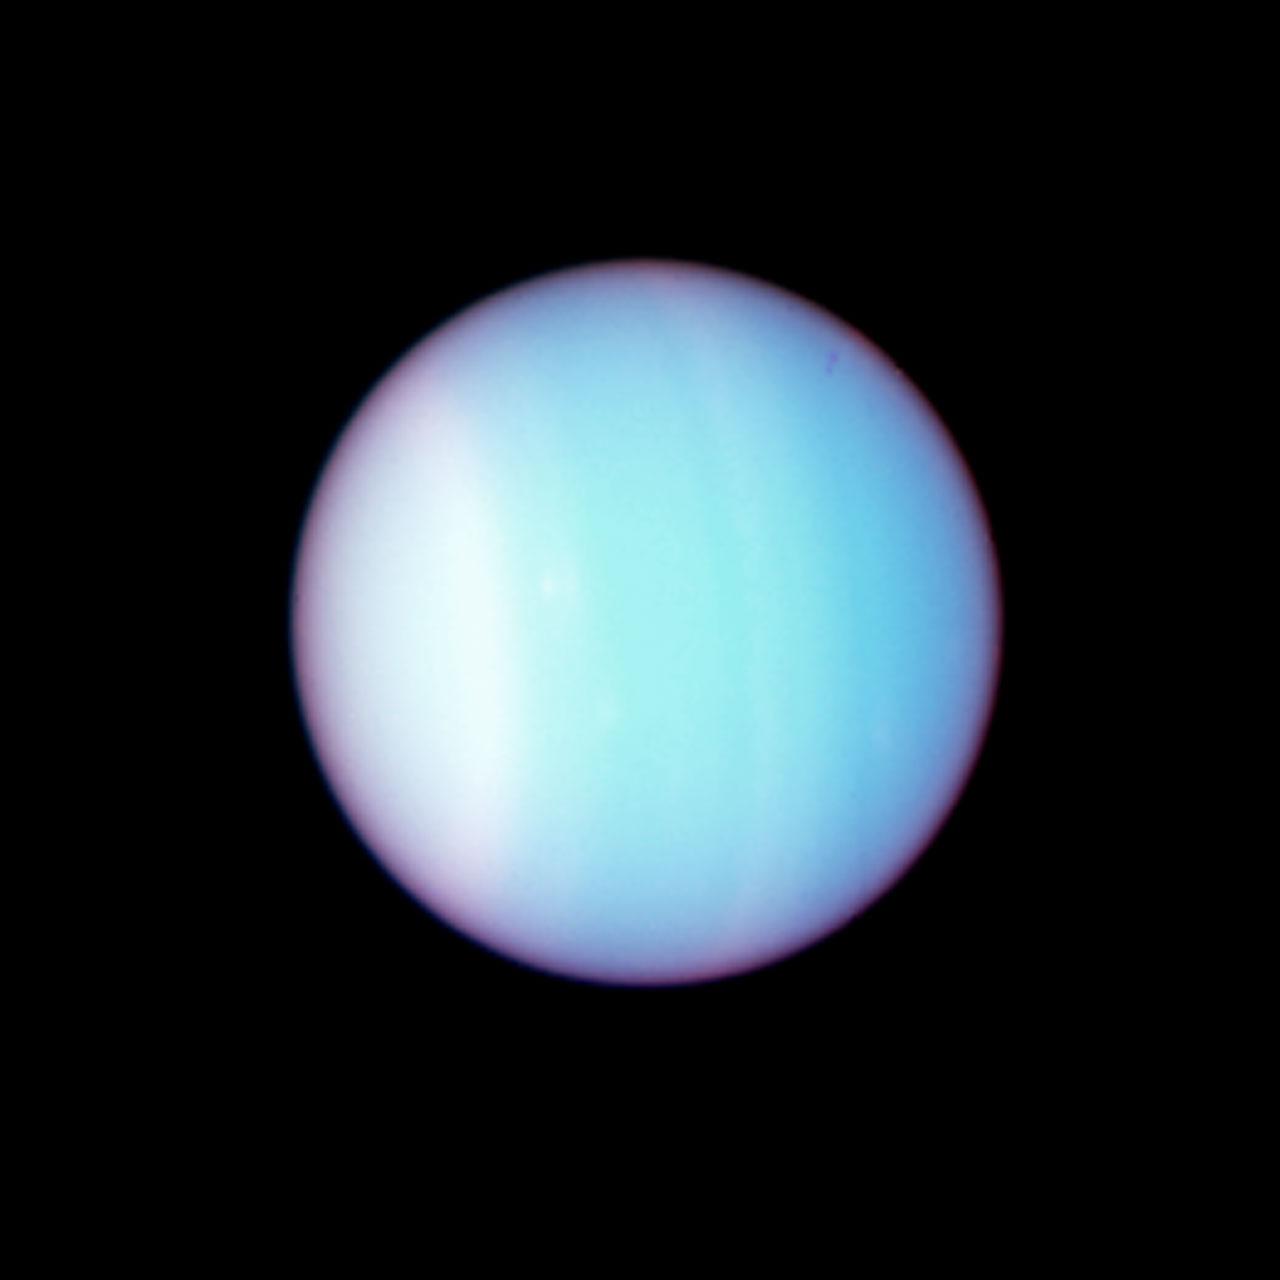 Uranus Colour Composite Full Size Image Esa Hubble